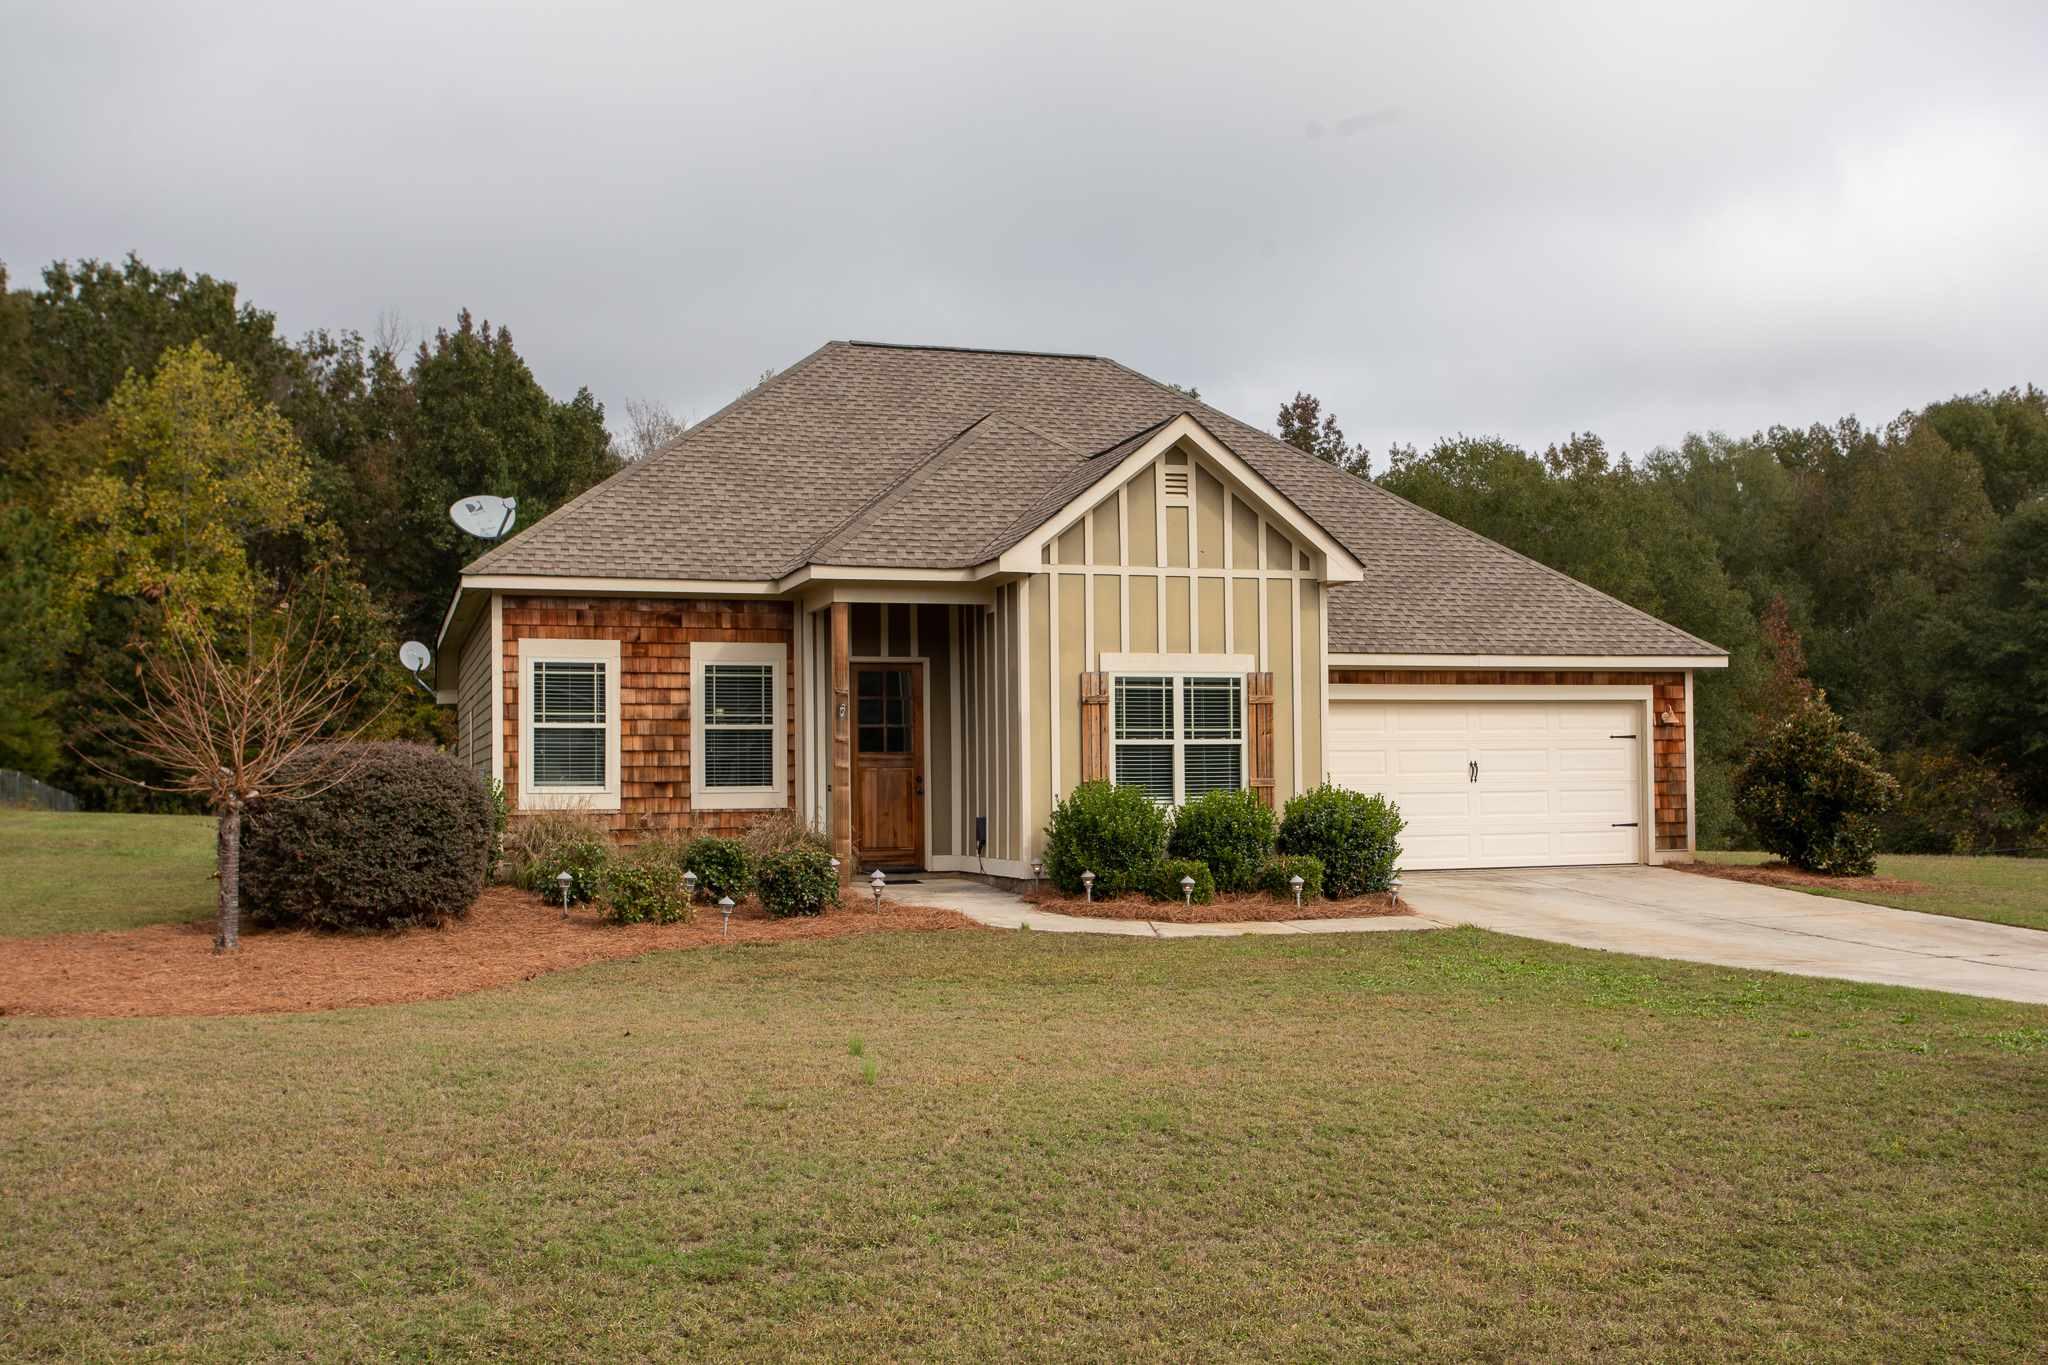 137 HUNTERS CHASE COURT, Lake Oconee in Putnam County, GA 31024 Home for Sale